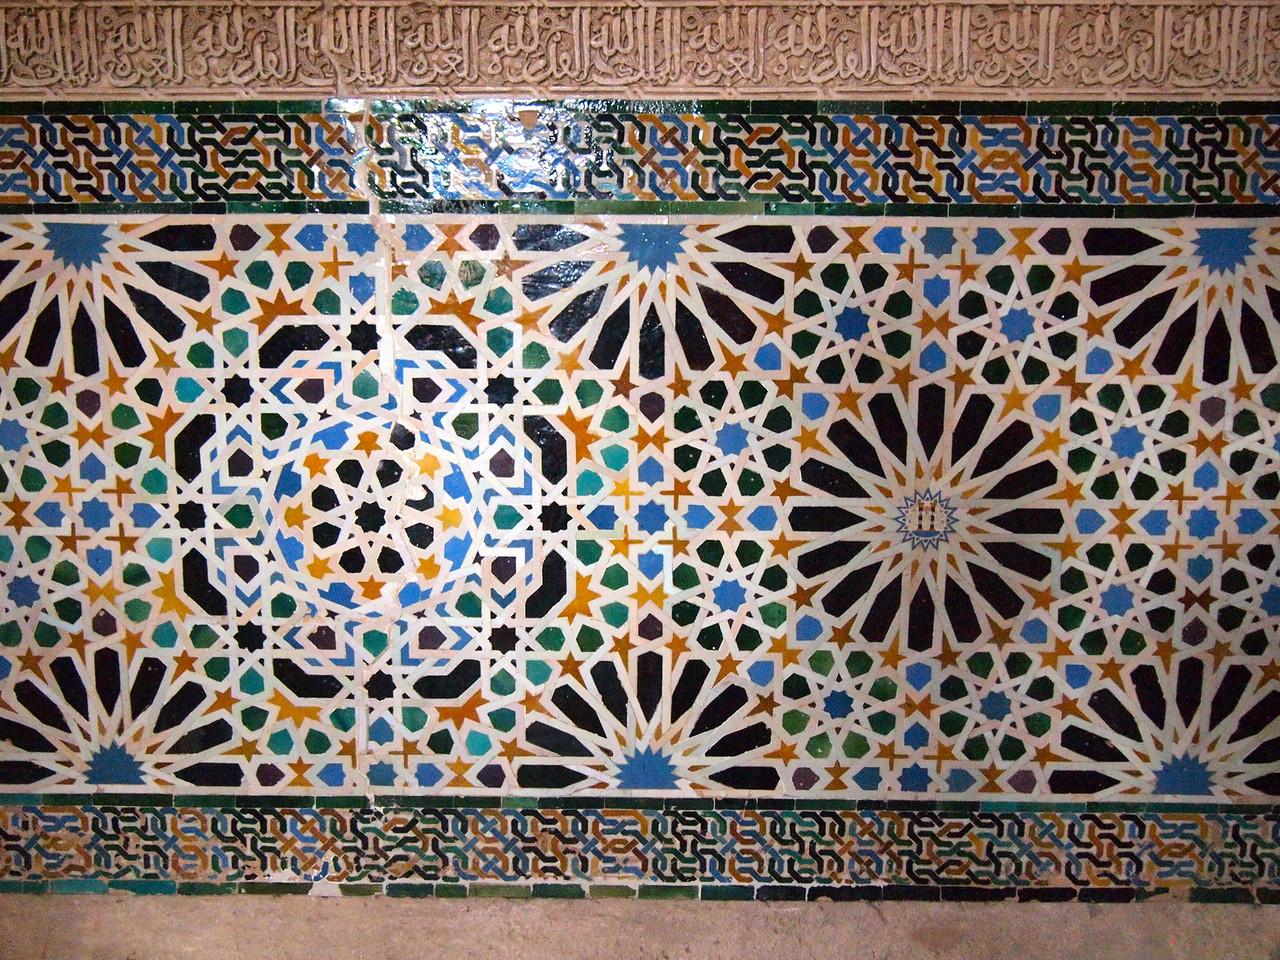 Mosaic in the Alhambra in Granada, Spain